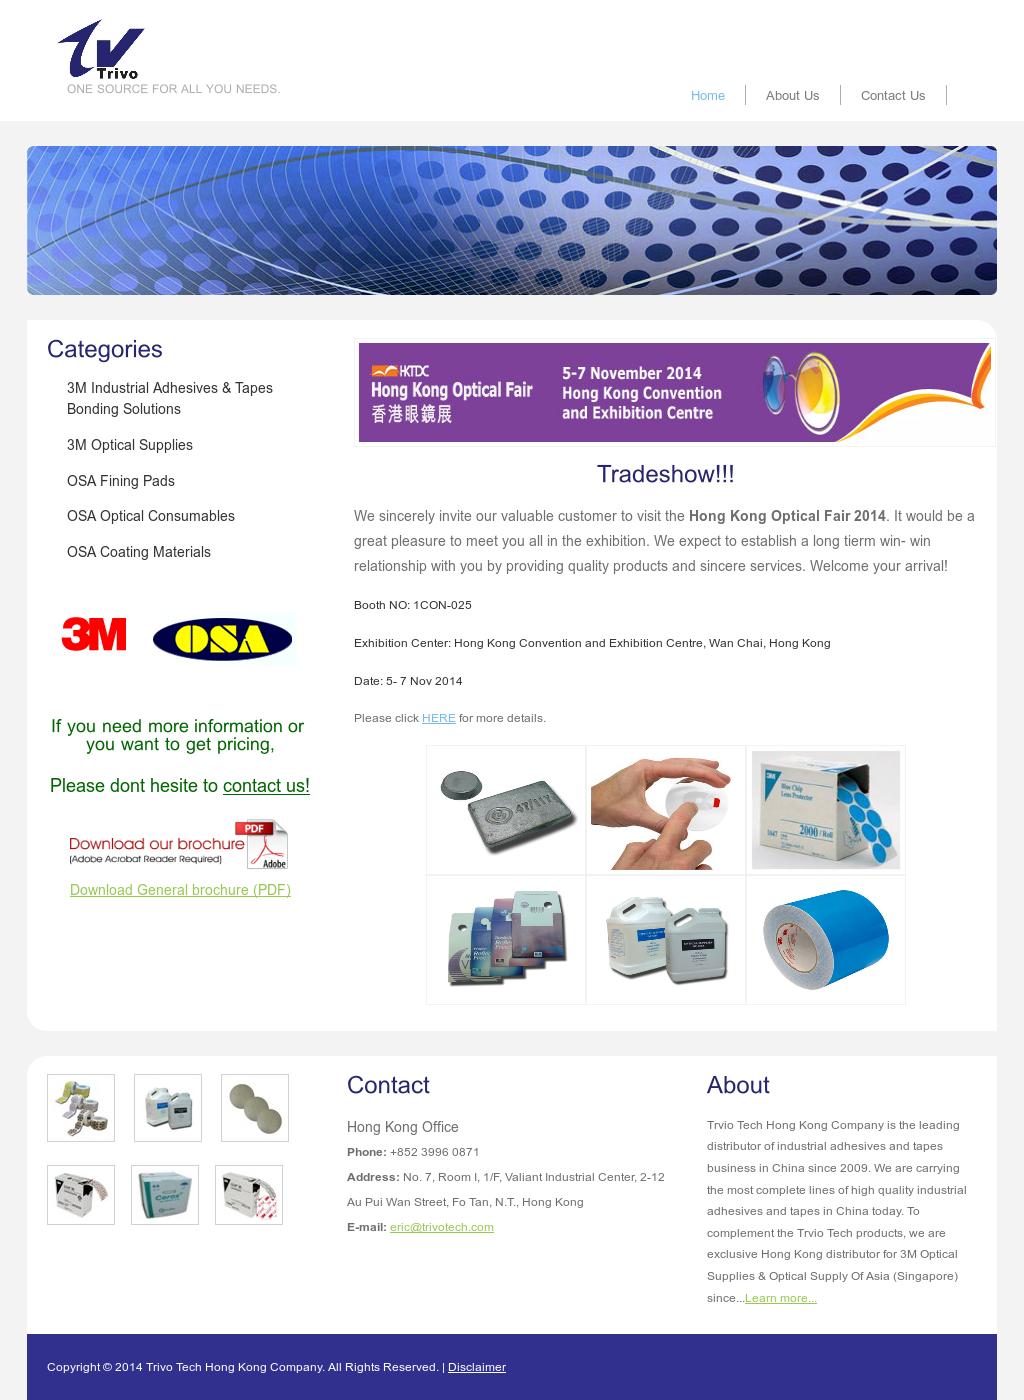 Trivo Tech Hong Kong Company Competitors, Revenue and Employees